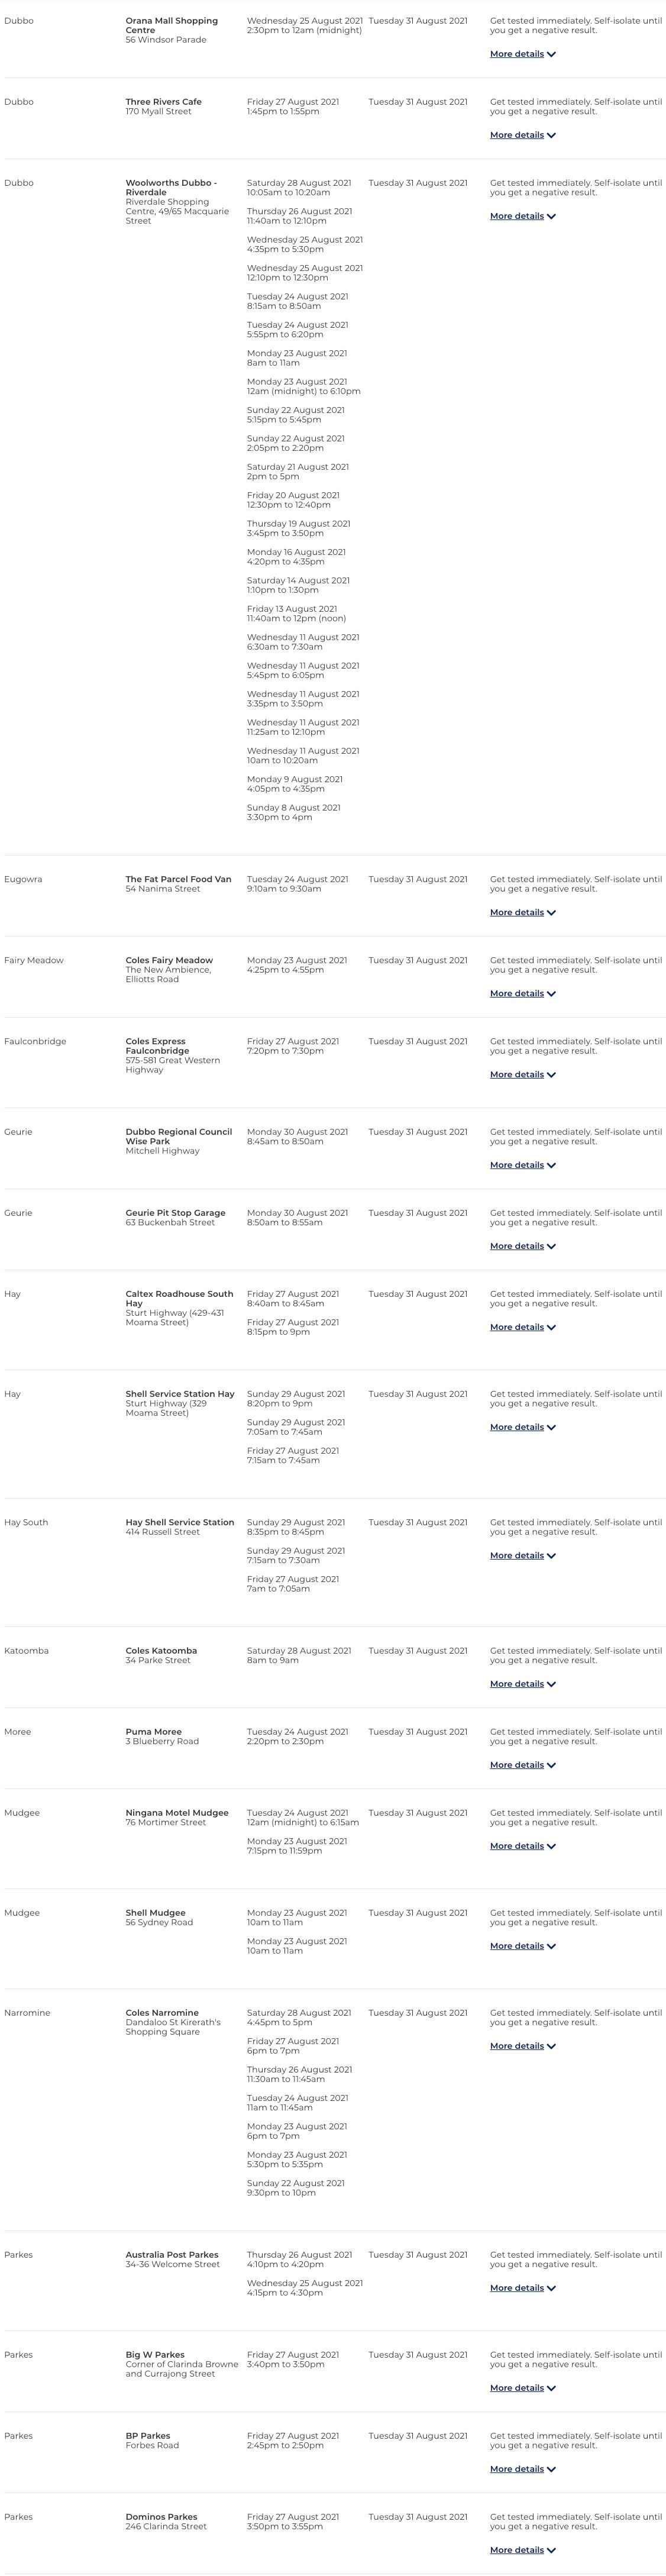 www.nsw.gov.au_covid-19_nsw-covid-19-case-locations_case-locations (11).png